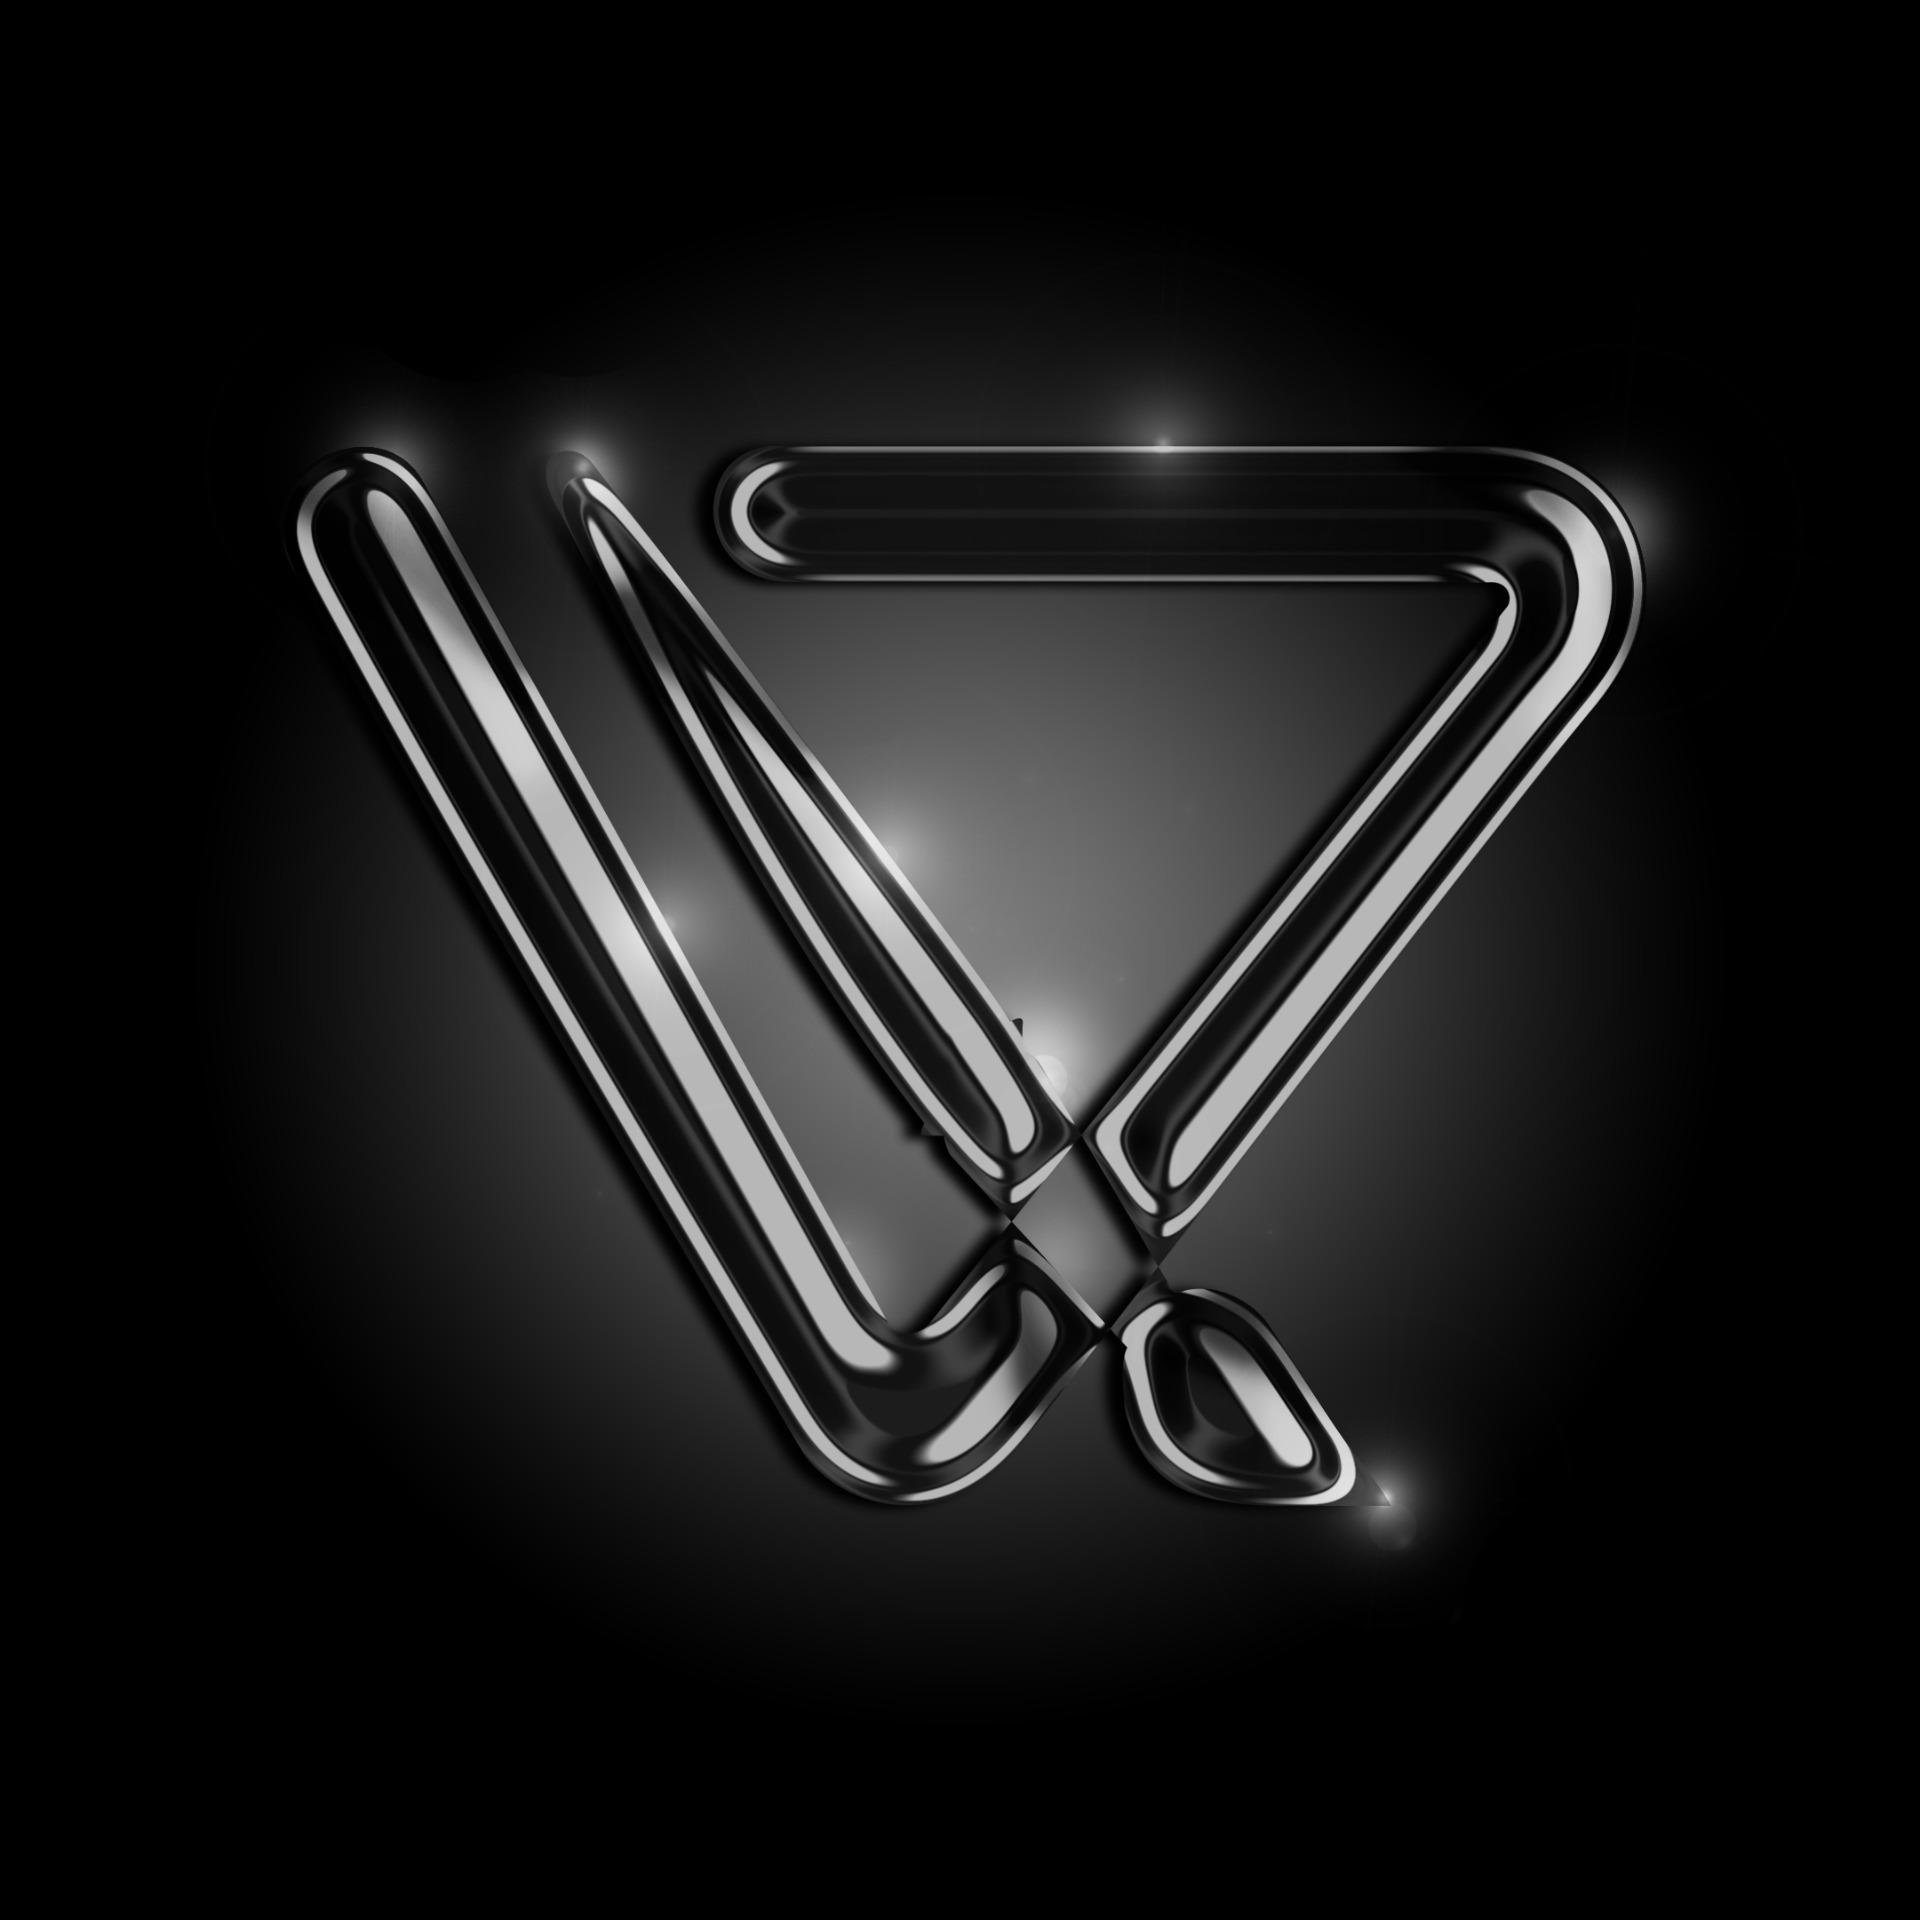 Vitaboard